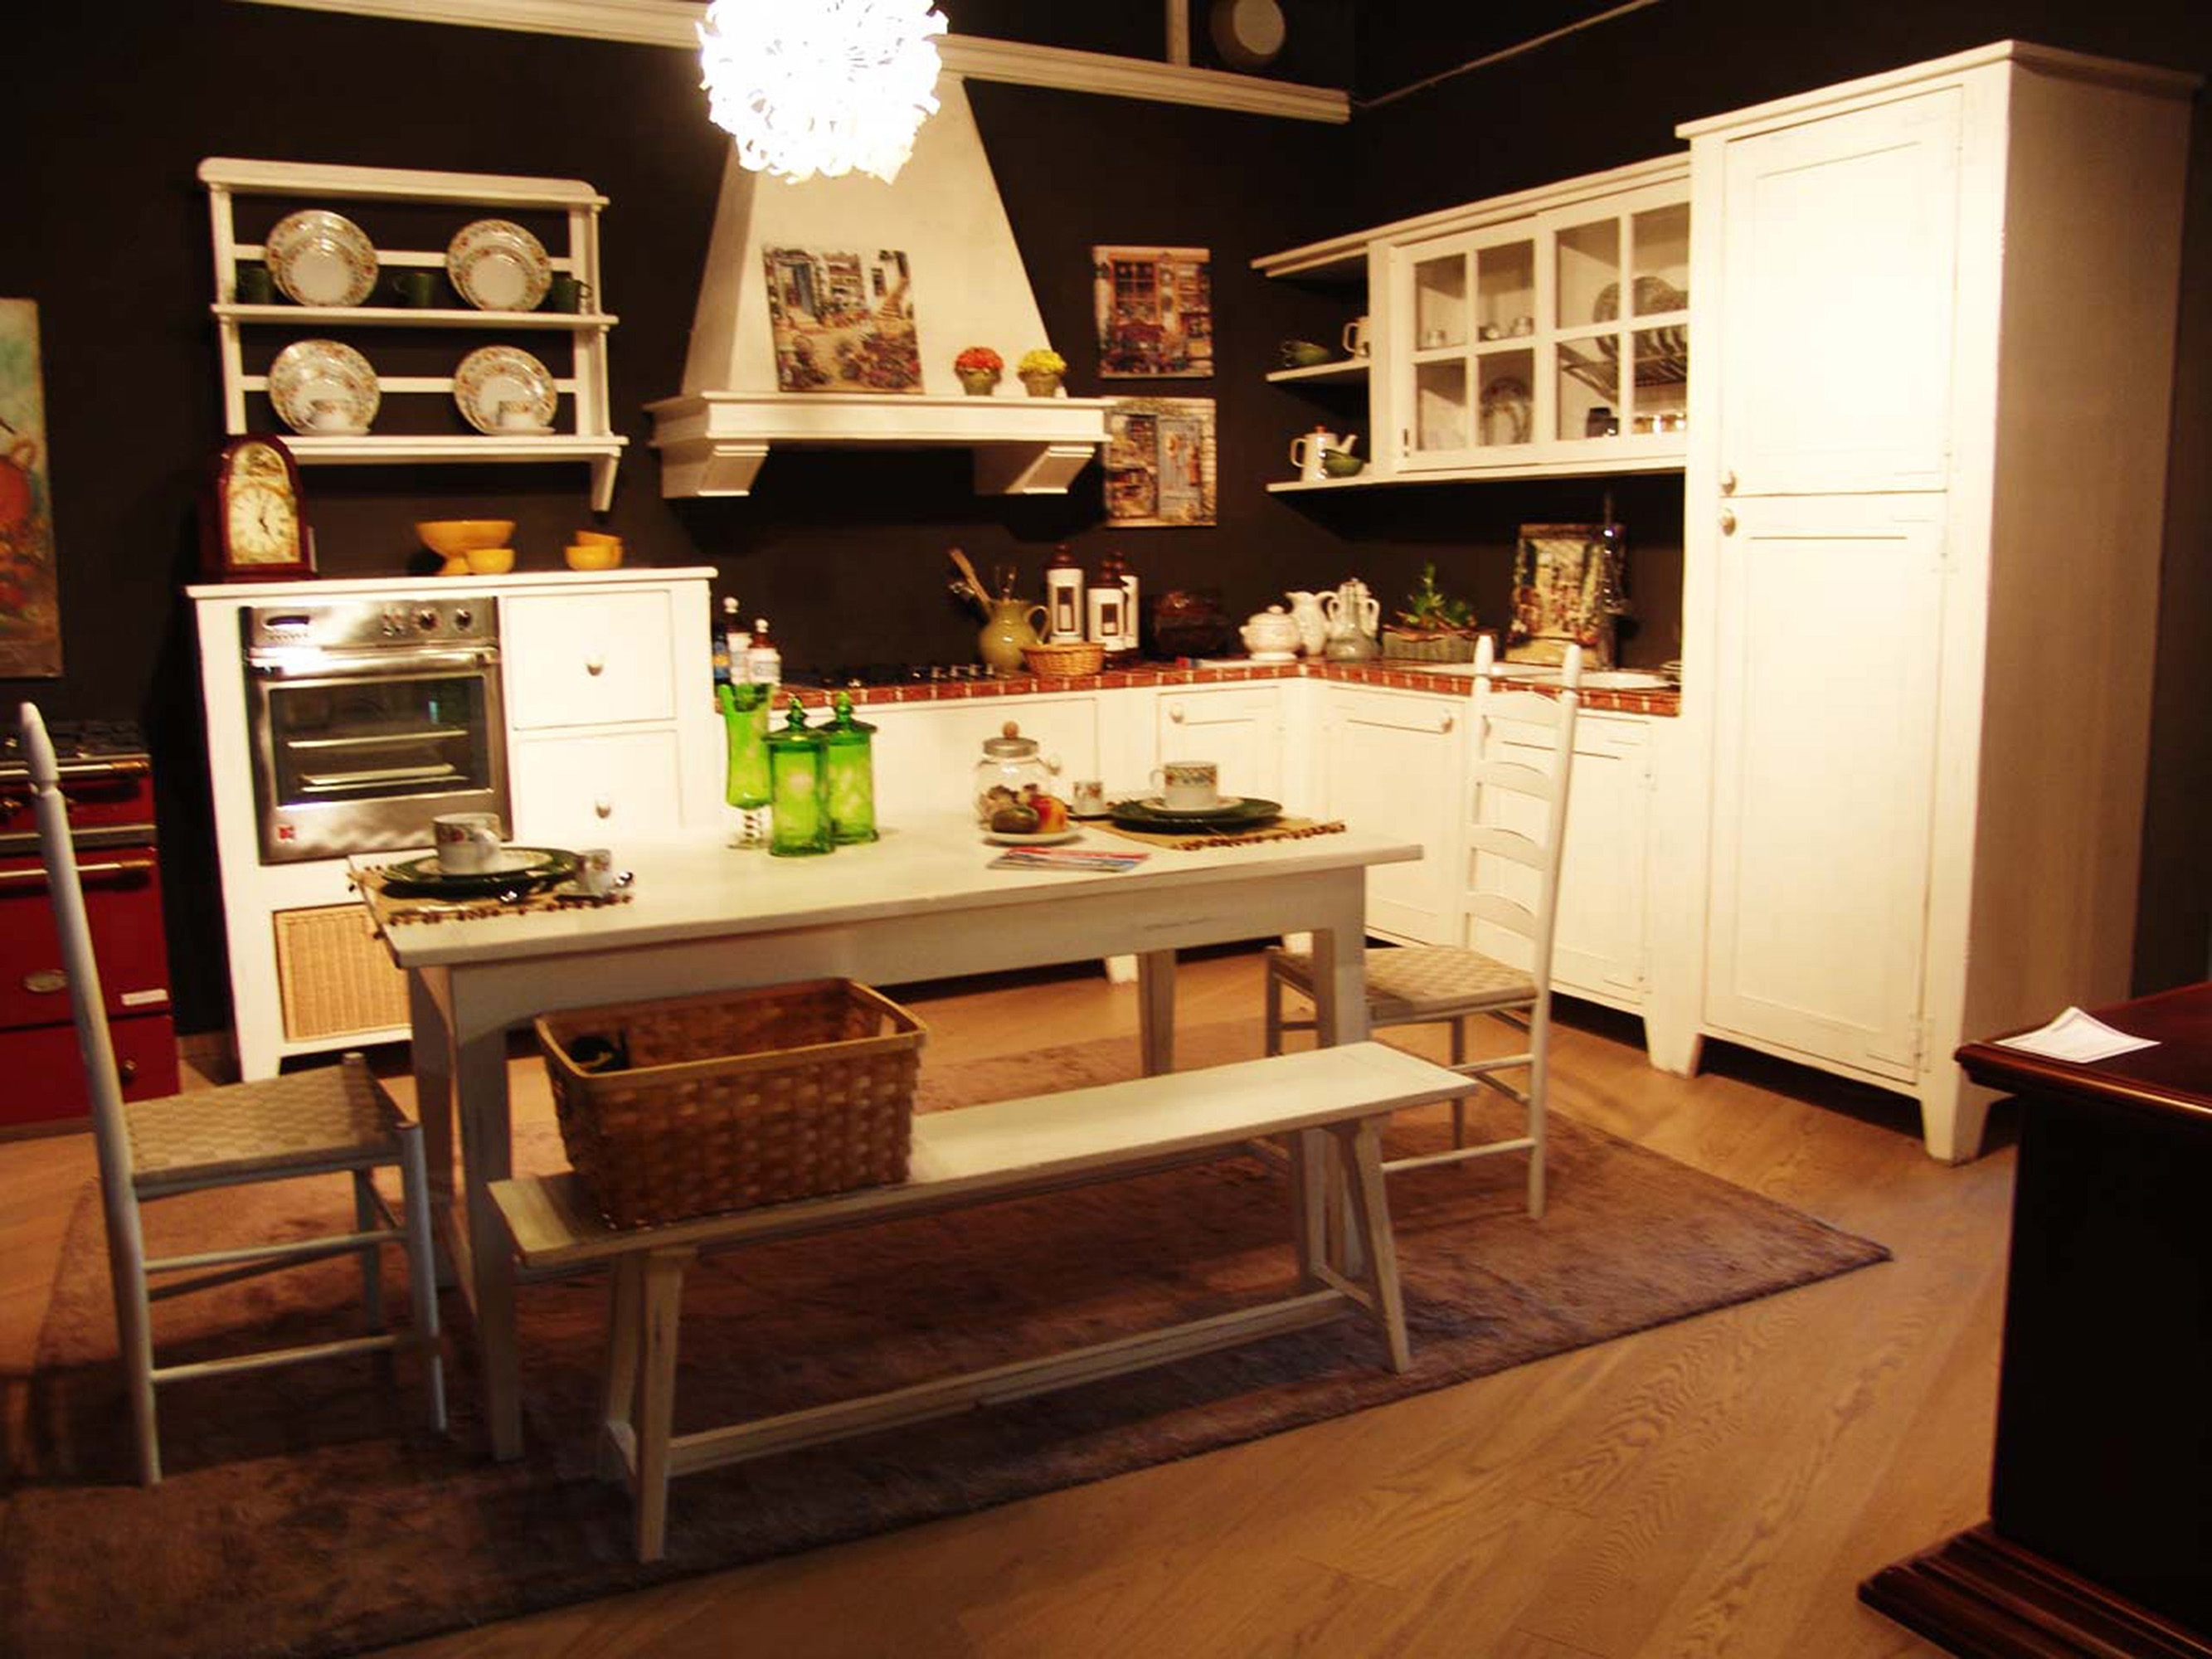 bamax cucine catalogo - 28 images - emejing bamax cucine catalogo ...